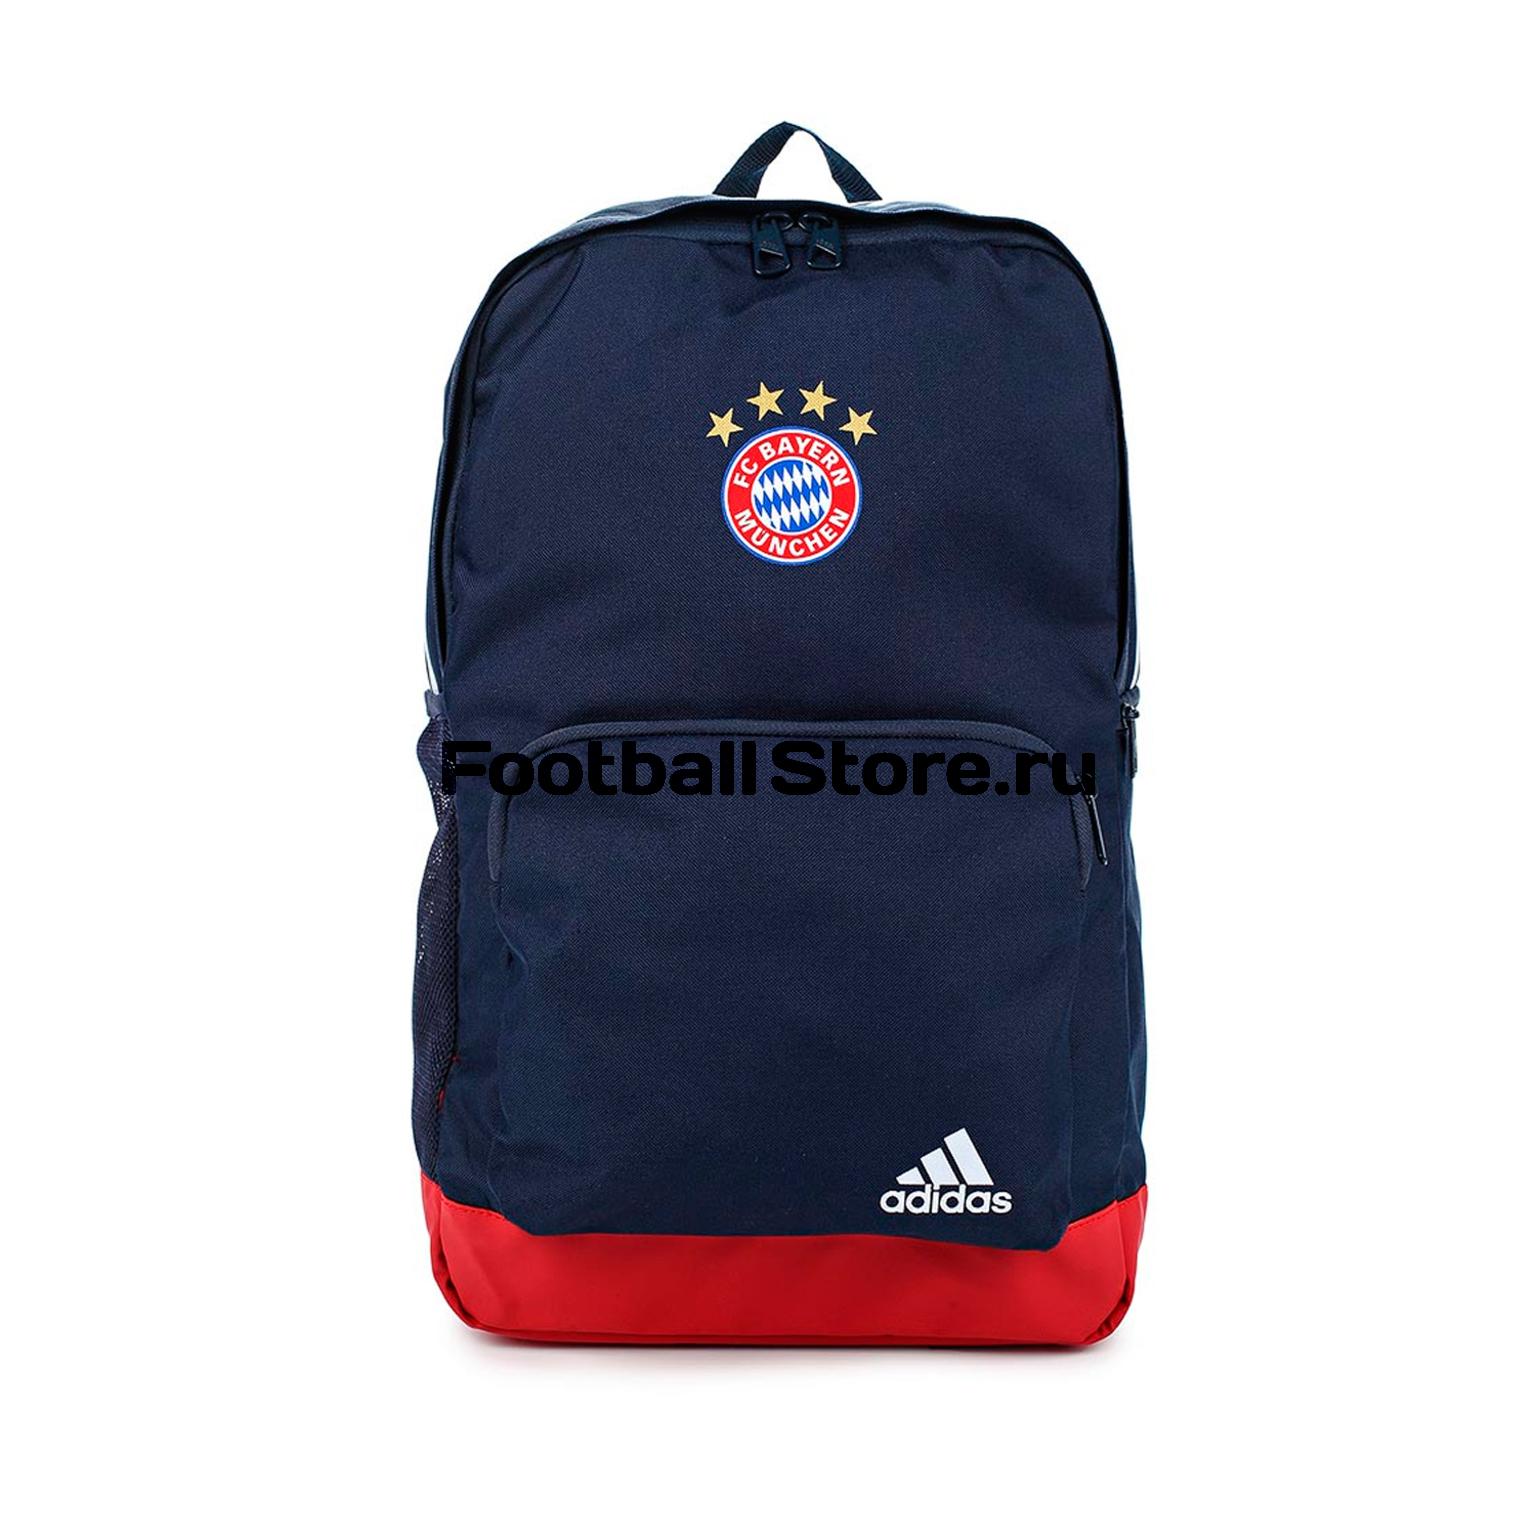 Bayern Adidas Рюкзак Adidas Bayern Backpack BR7049  цена